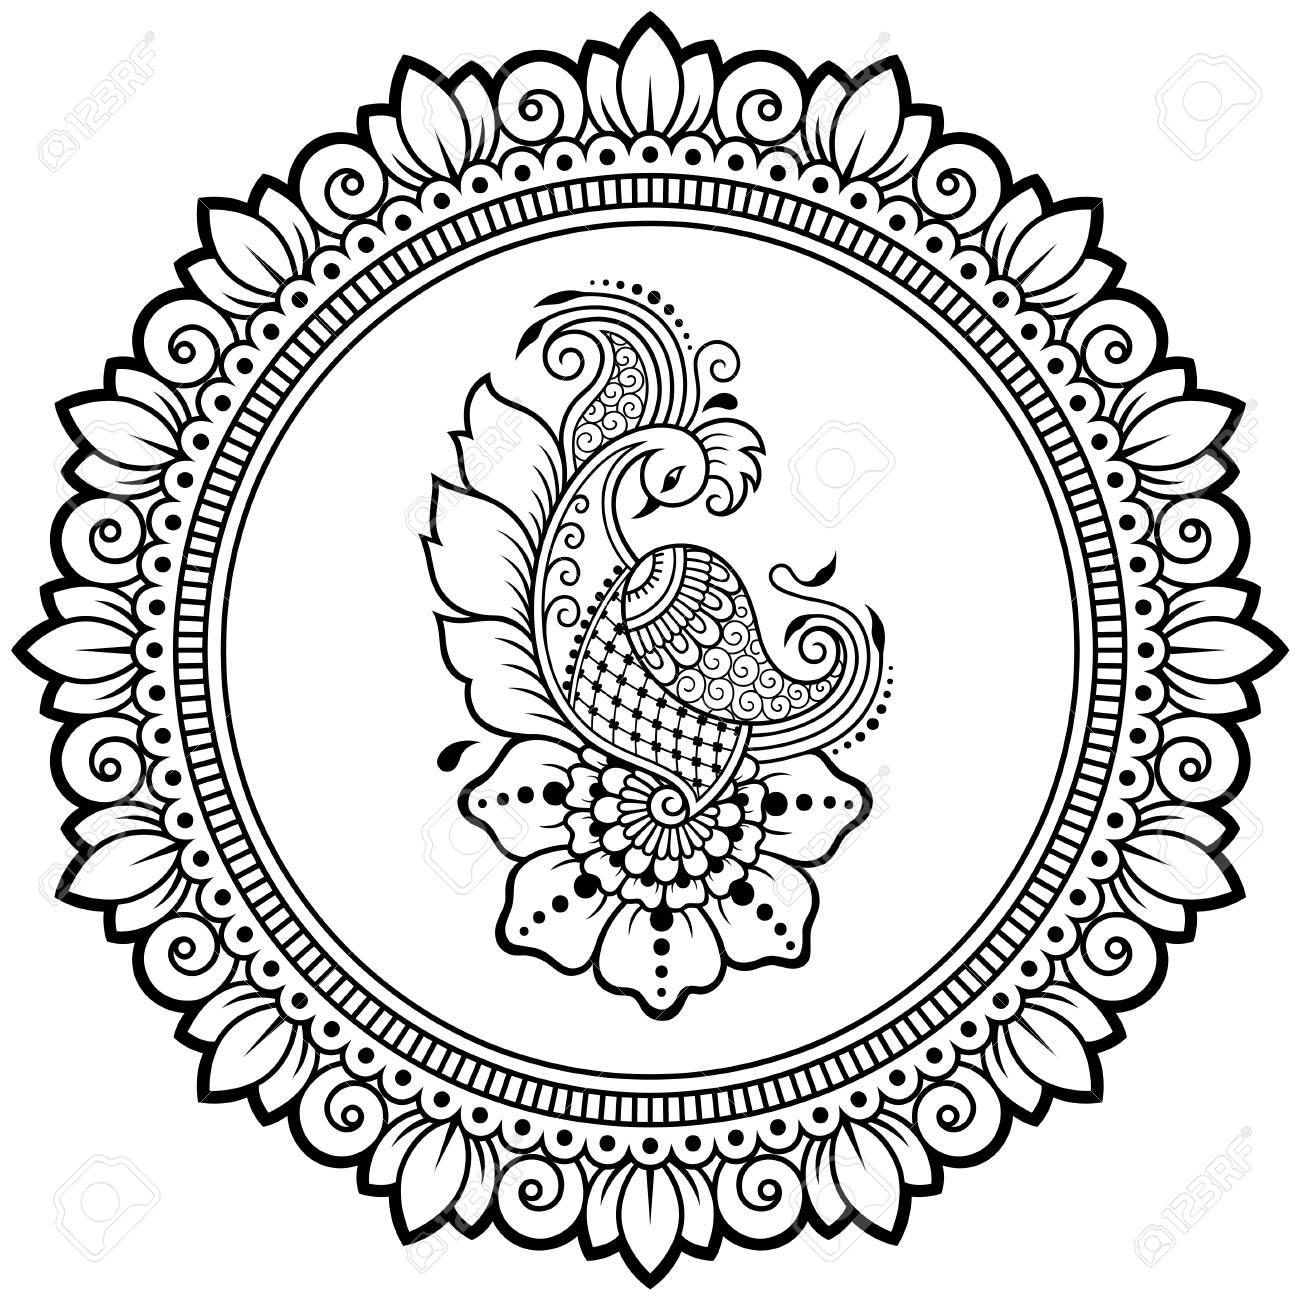 circular pattern in form of mandala with bird template peacock